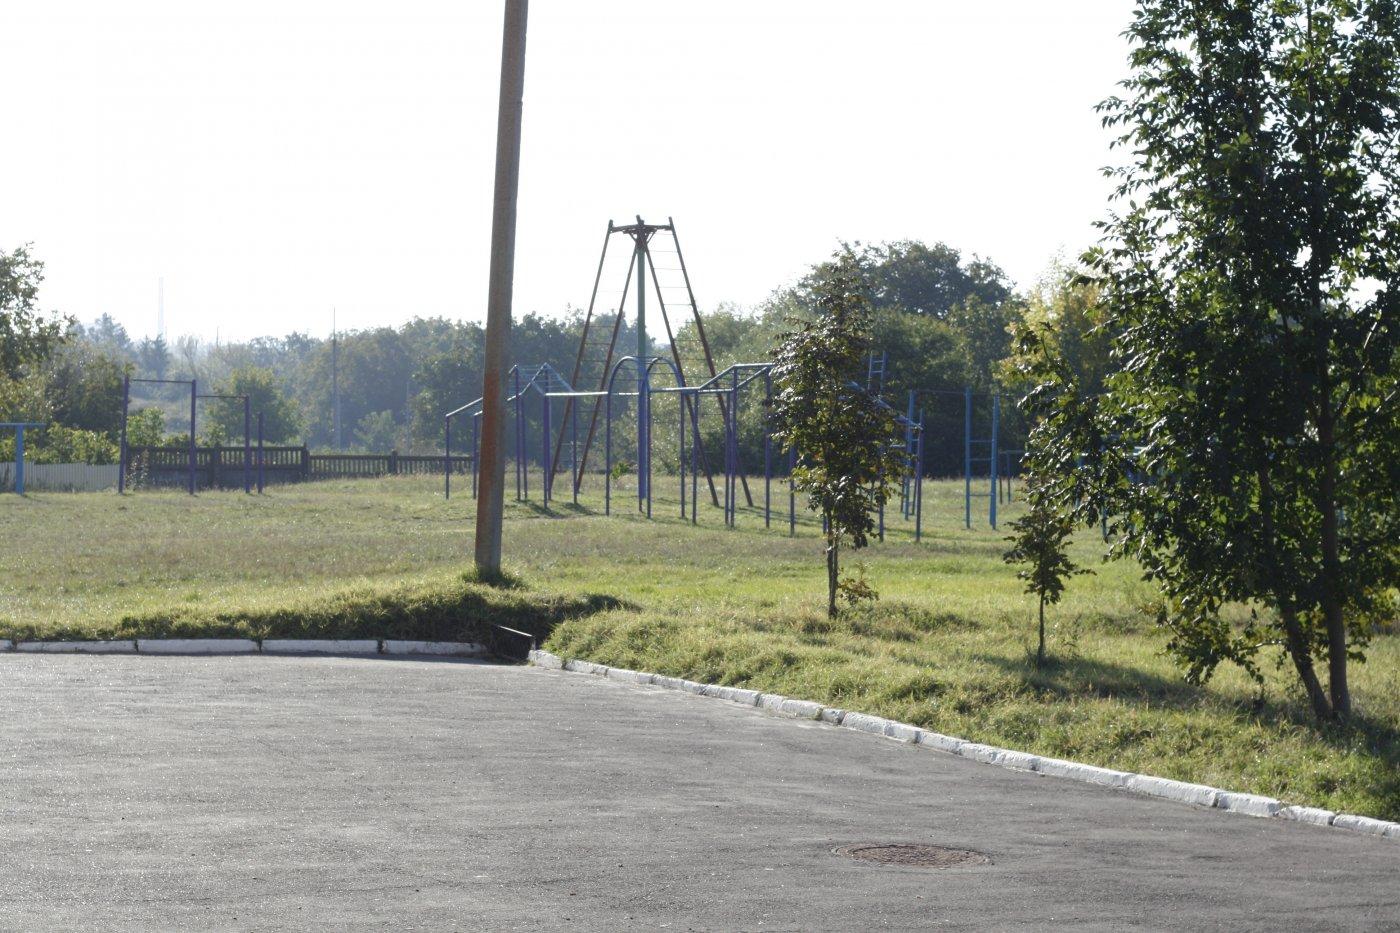 Фото _MG_7284.JPG. Молдова, Бендеры, улица Протягайловская